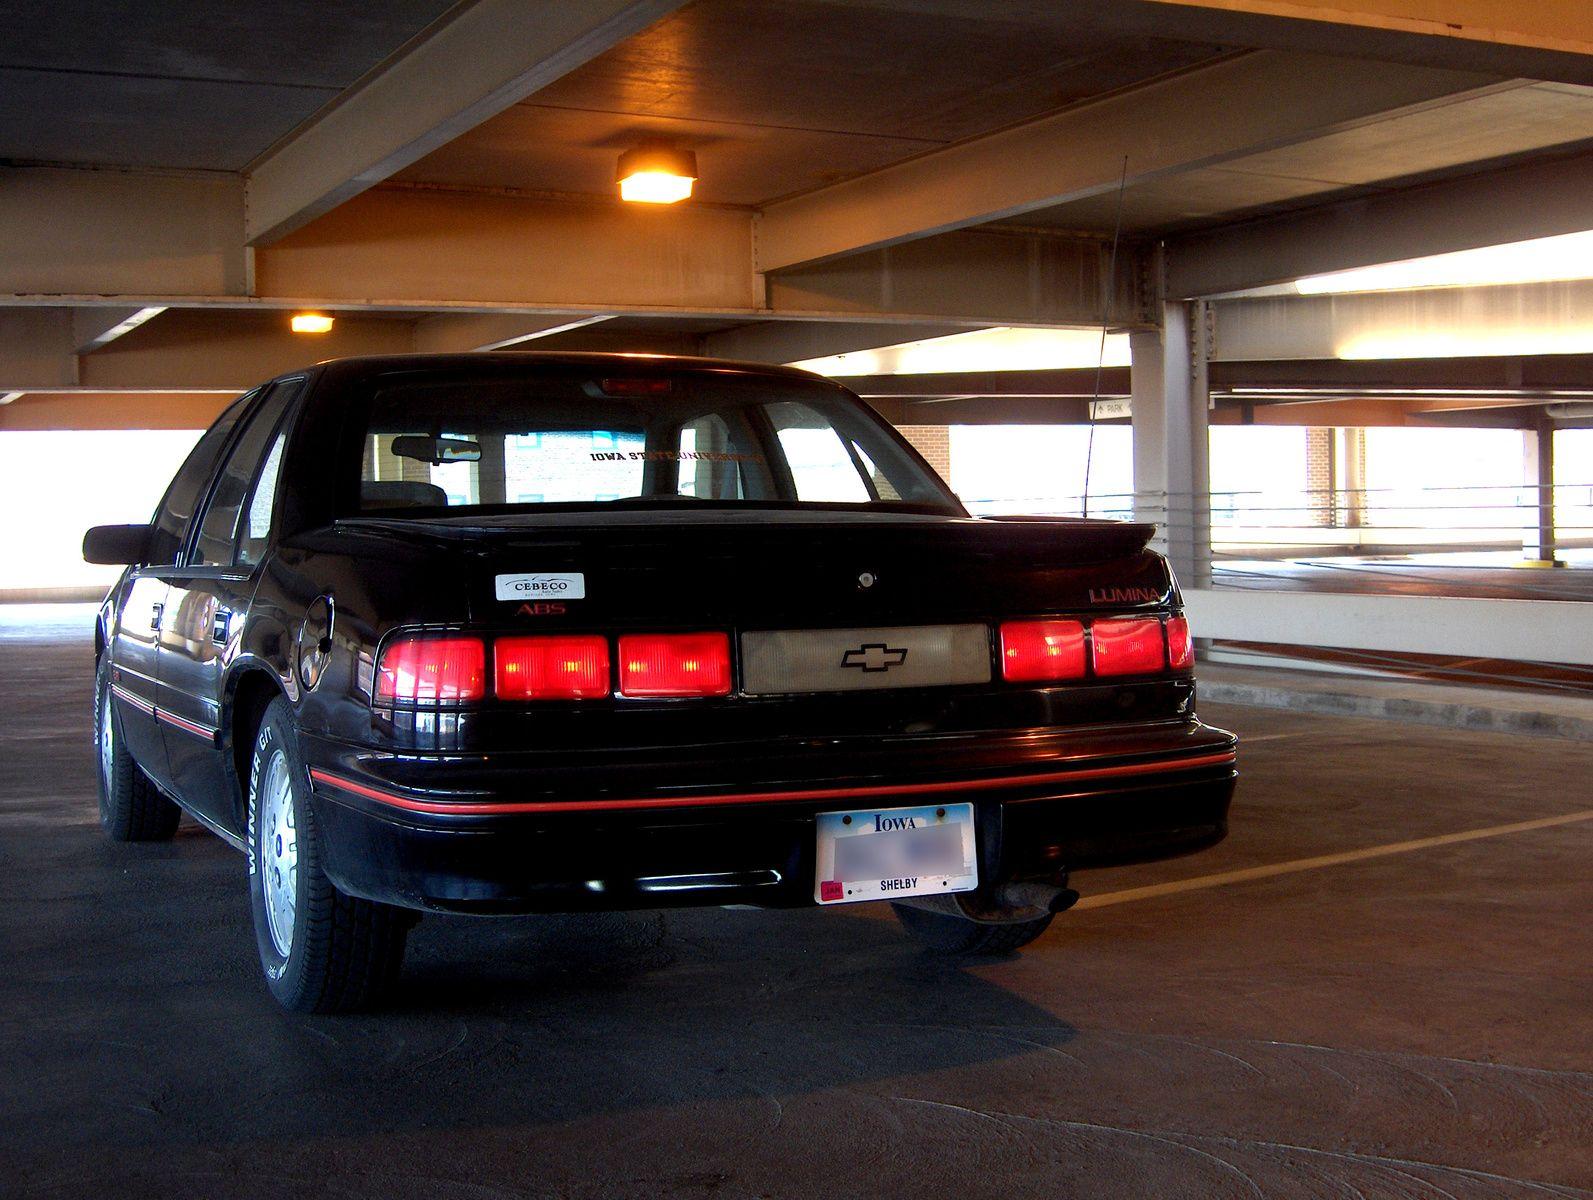 Worksheet. 1994 Chevrolet Lumina Euro Sedan httpkiawikicom1994chevrolet